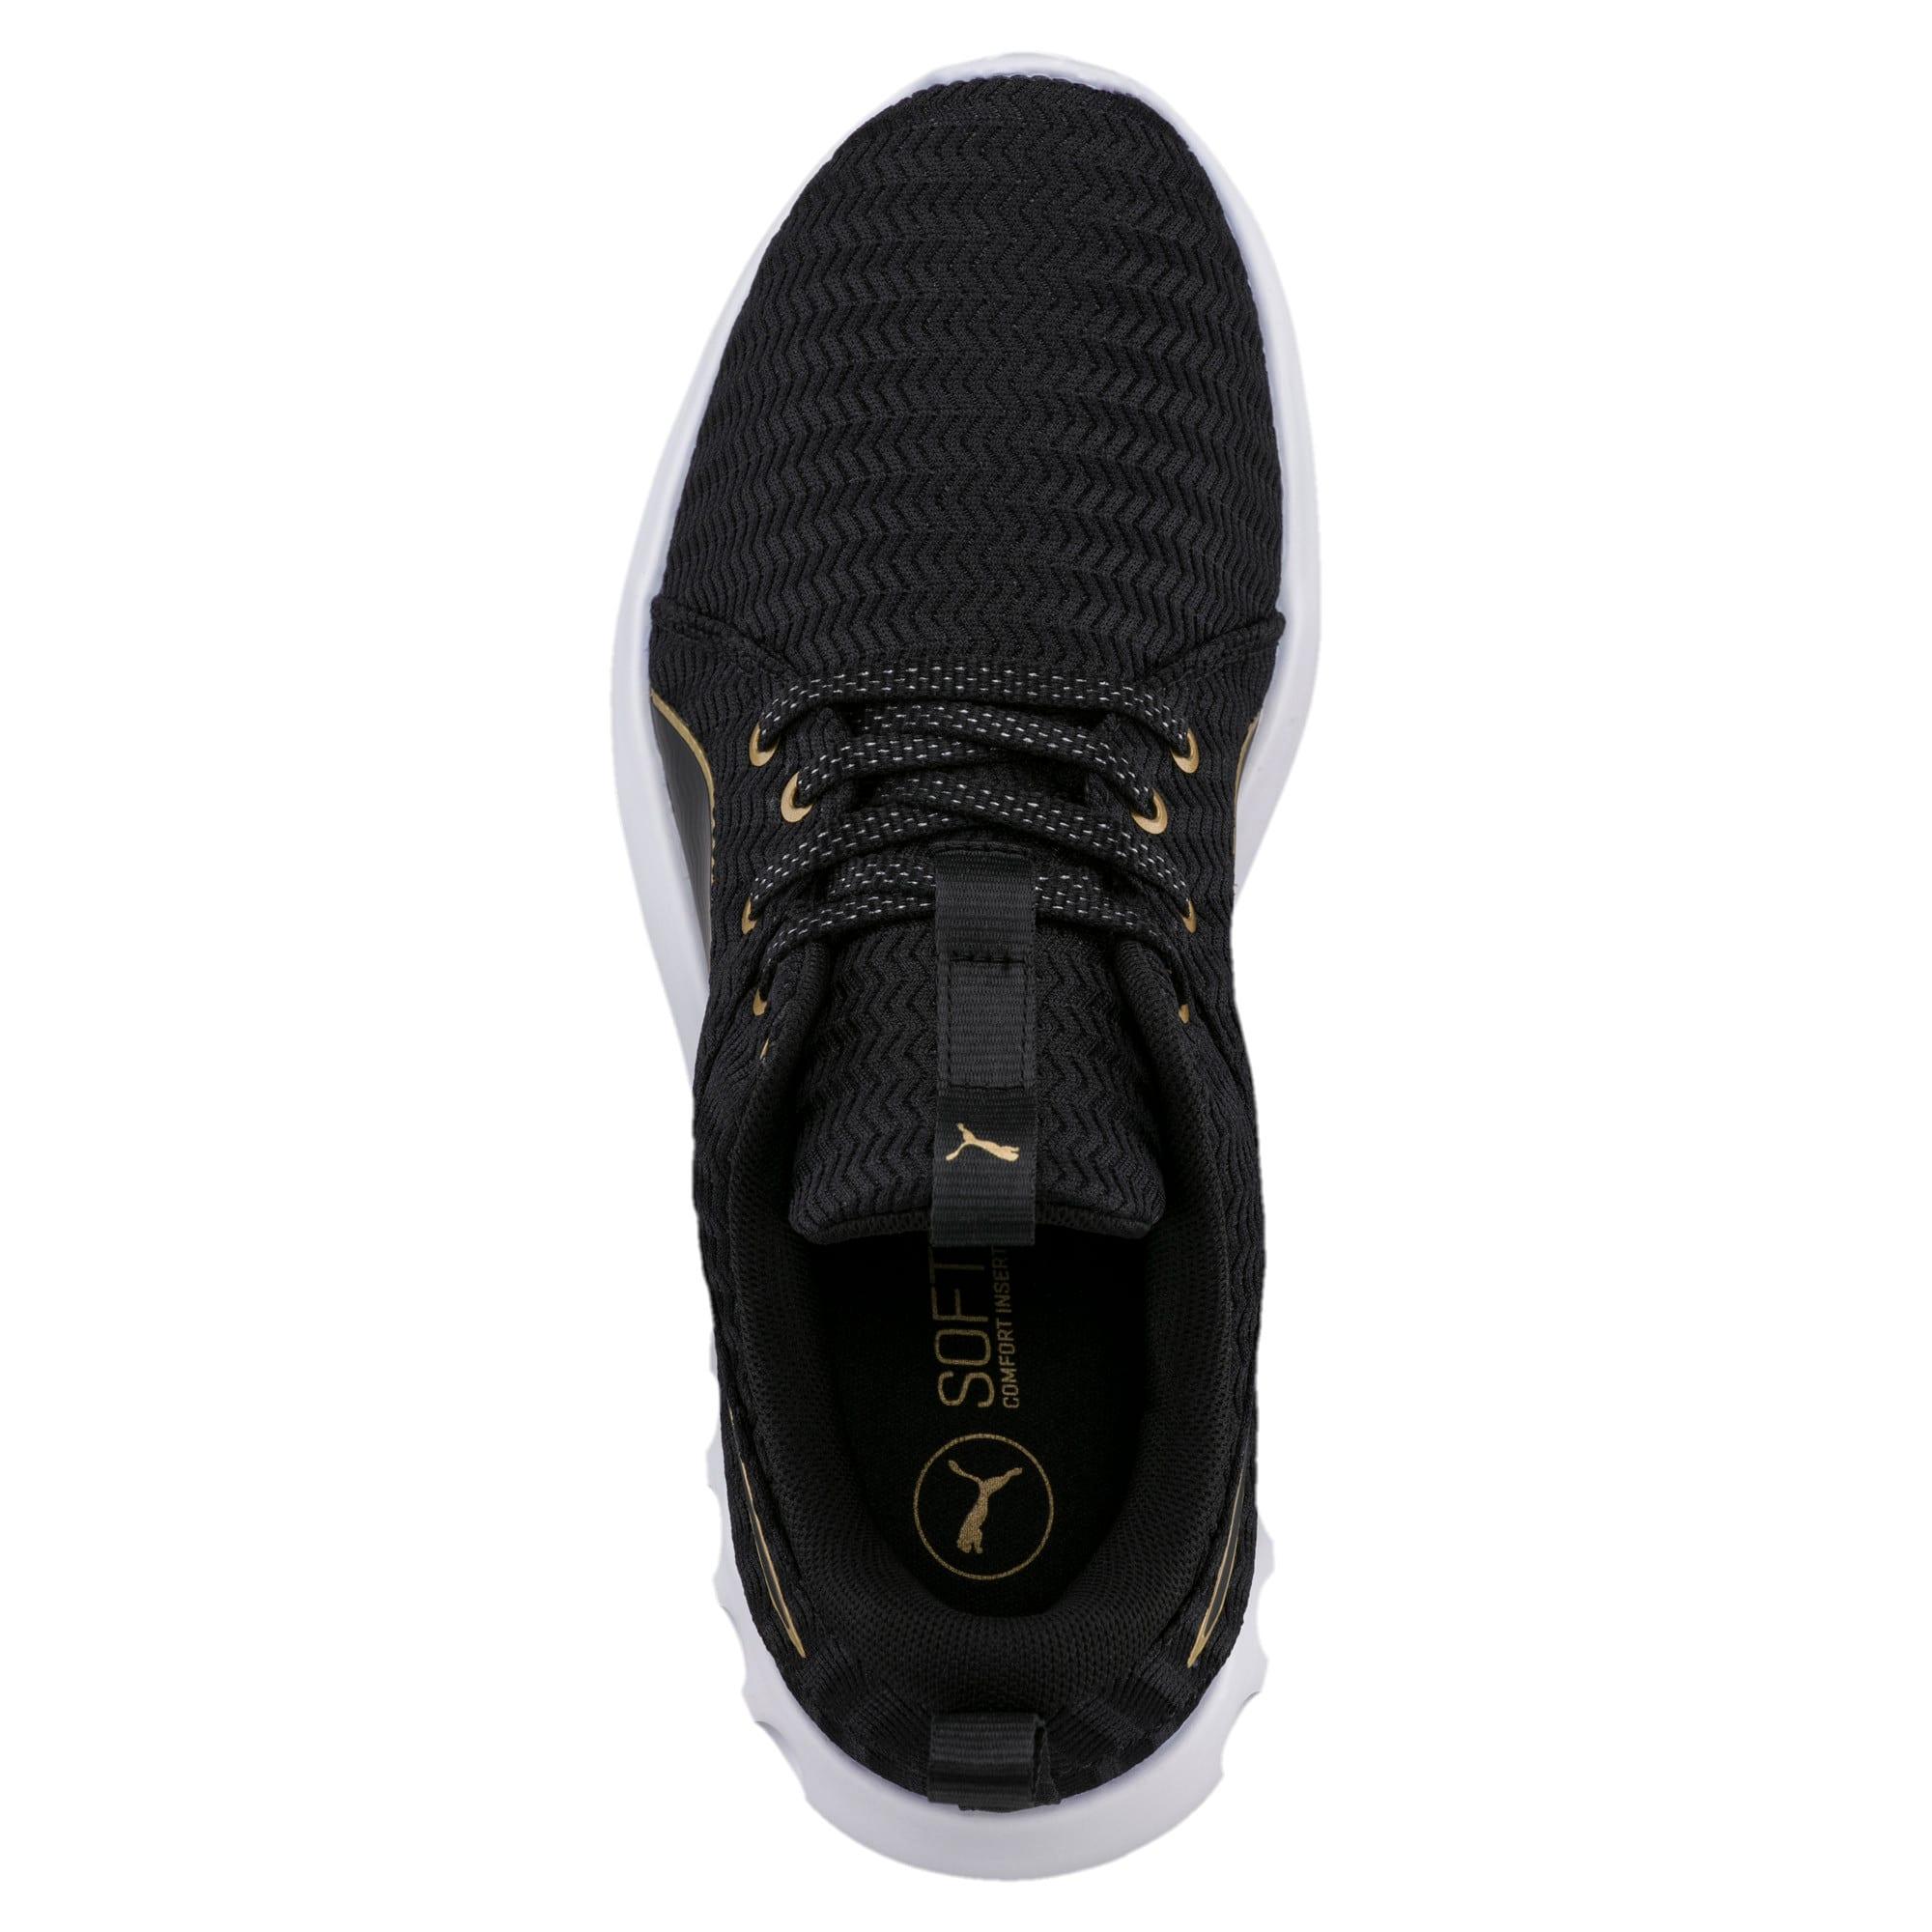 Thumbnail 5 of Carson 2 Metallic Women's Running Shoes, Puma Black-Gold, medium